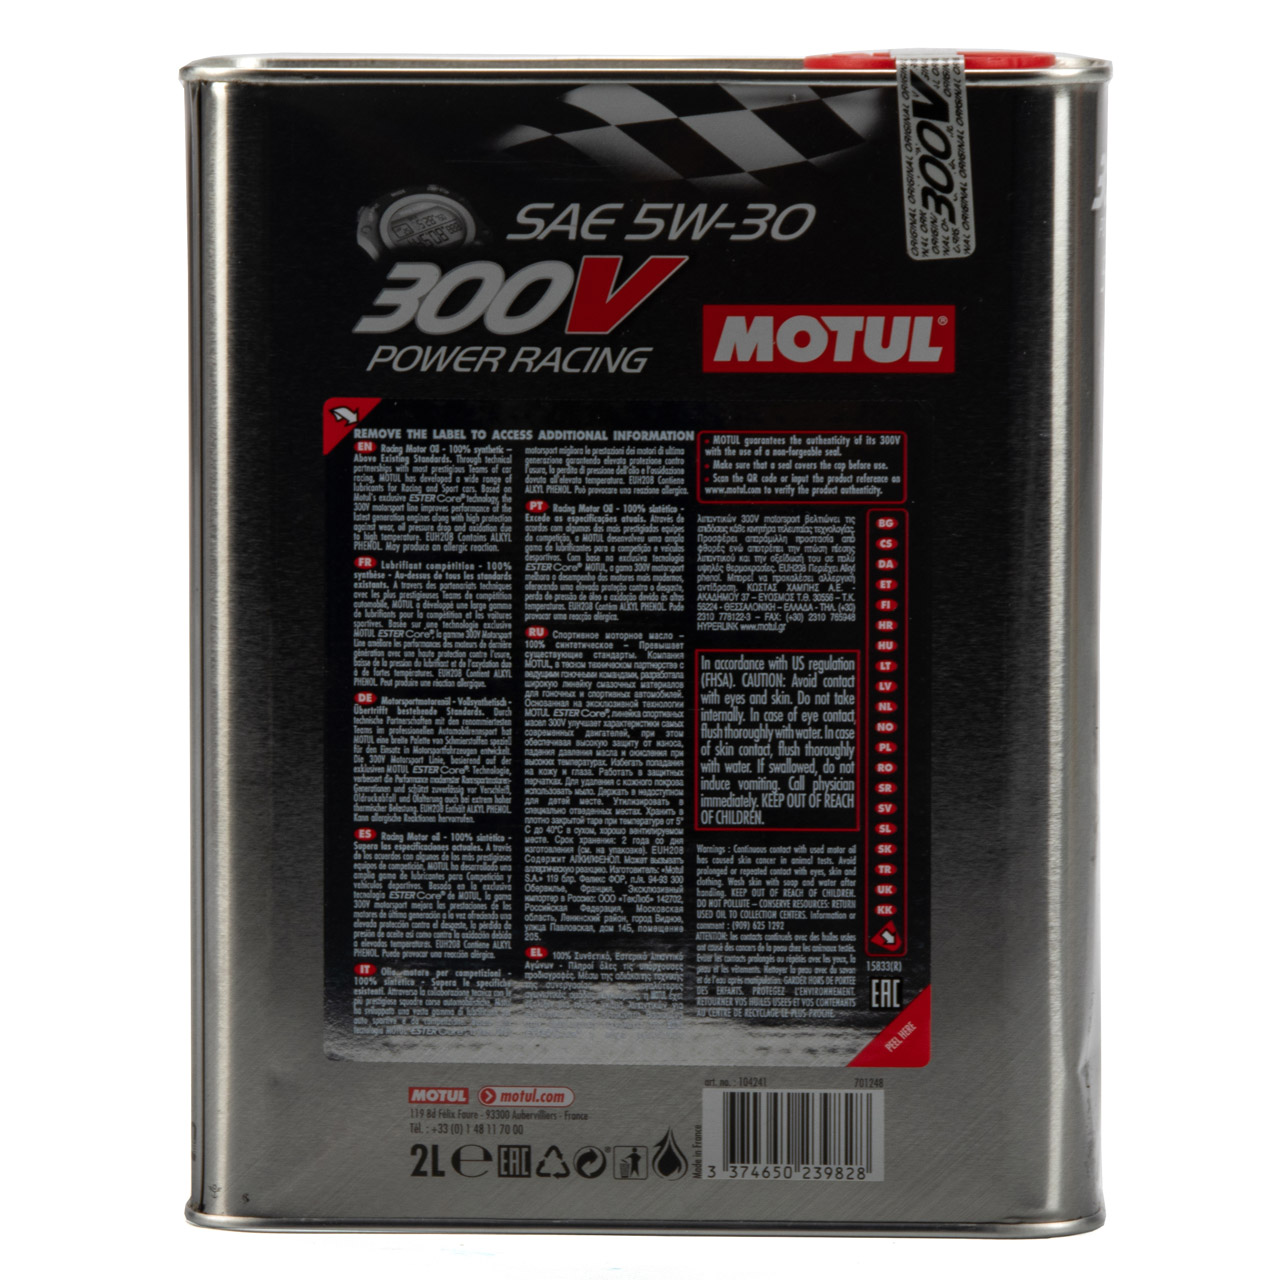 MOTUL 300V POWER RACING Motoröl Öl 5W30 100% Synthetic Ester Core - 2L 2 Liter